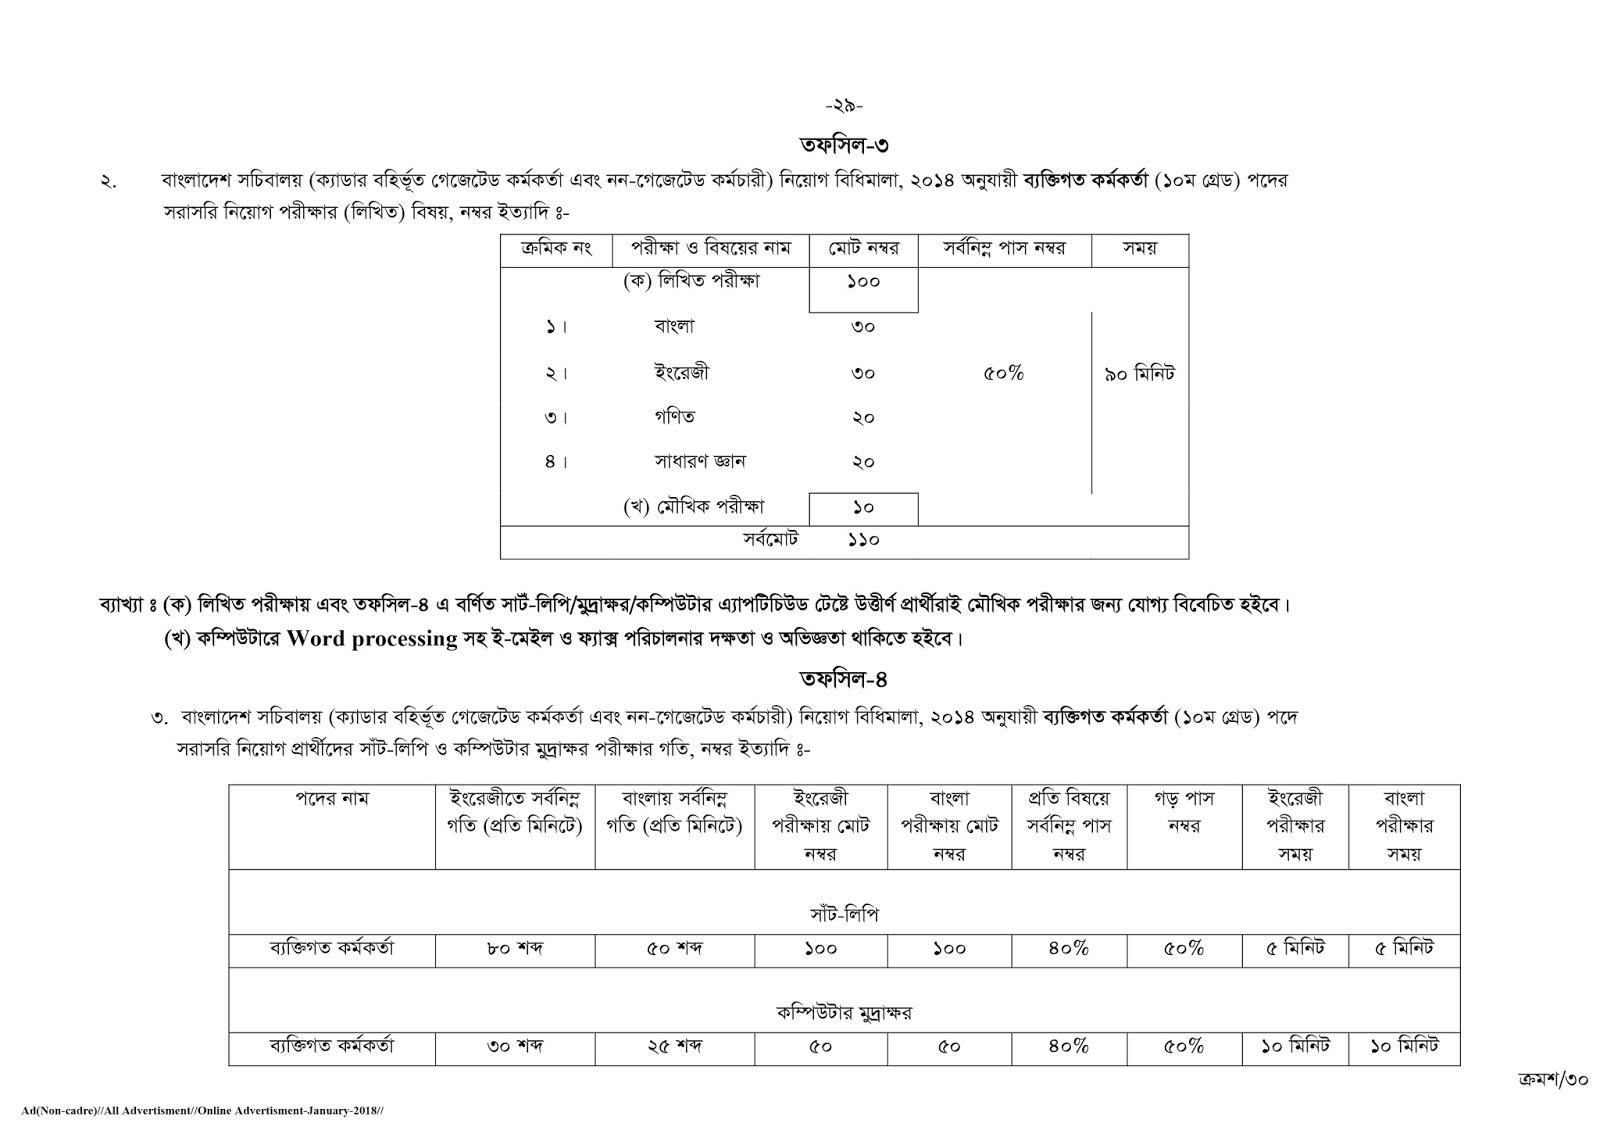 Bangladesh Public Service Commission (BPSC) Non Cadre Recruitment 2018 Mark Distribution